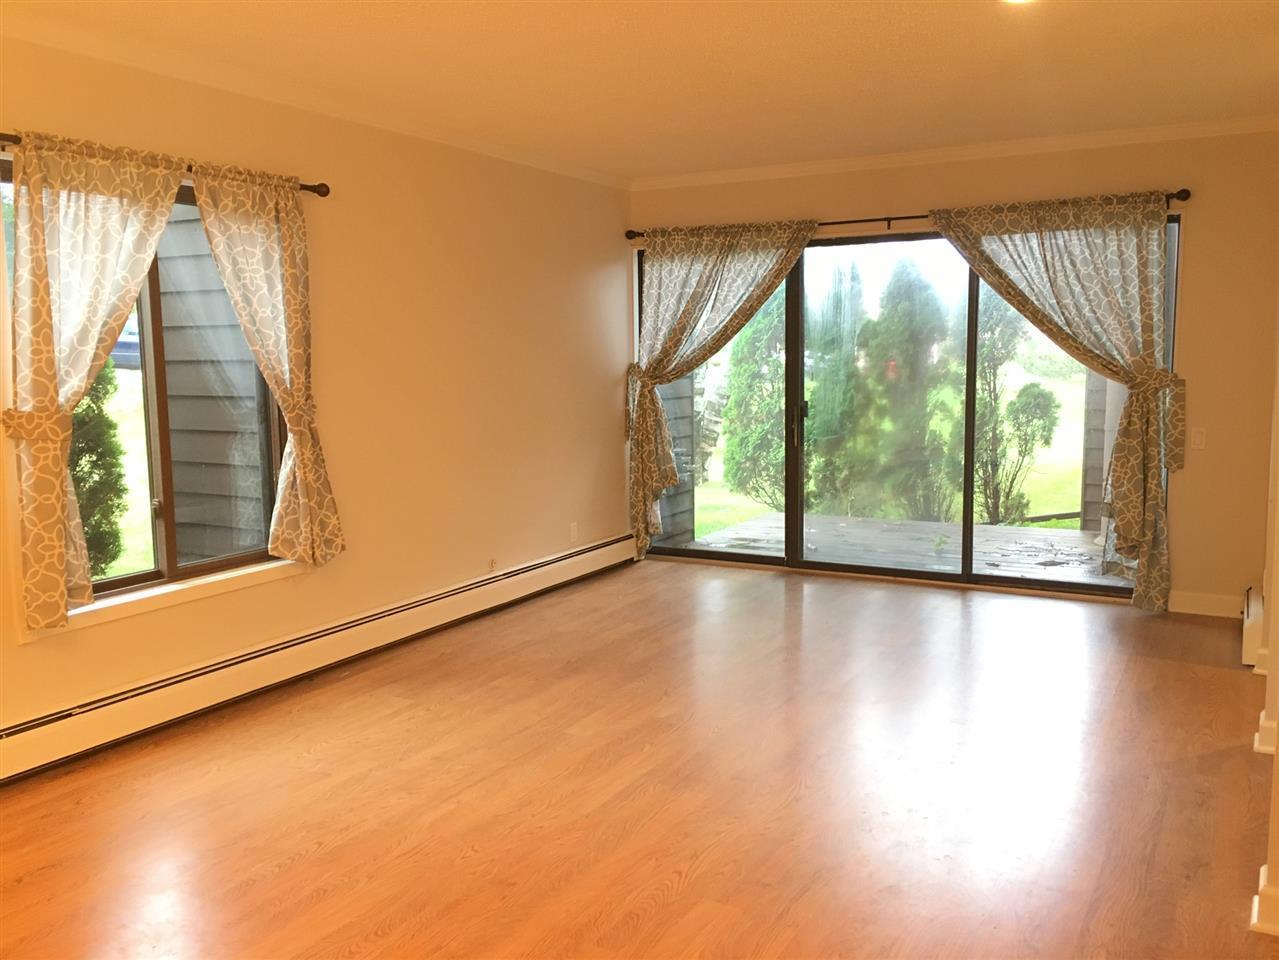 Property Photo ... & Listing: 927 Spring #Unit 6 Petoskey MI.| MLS# 453026 | Ethan ...